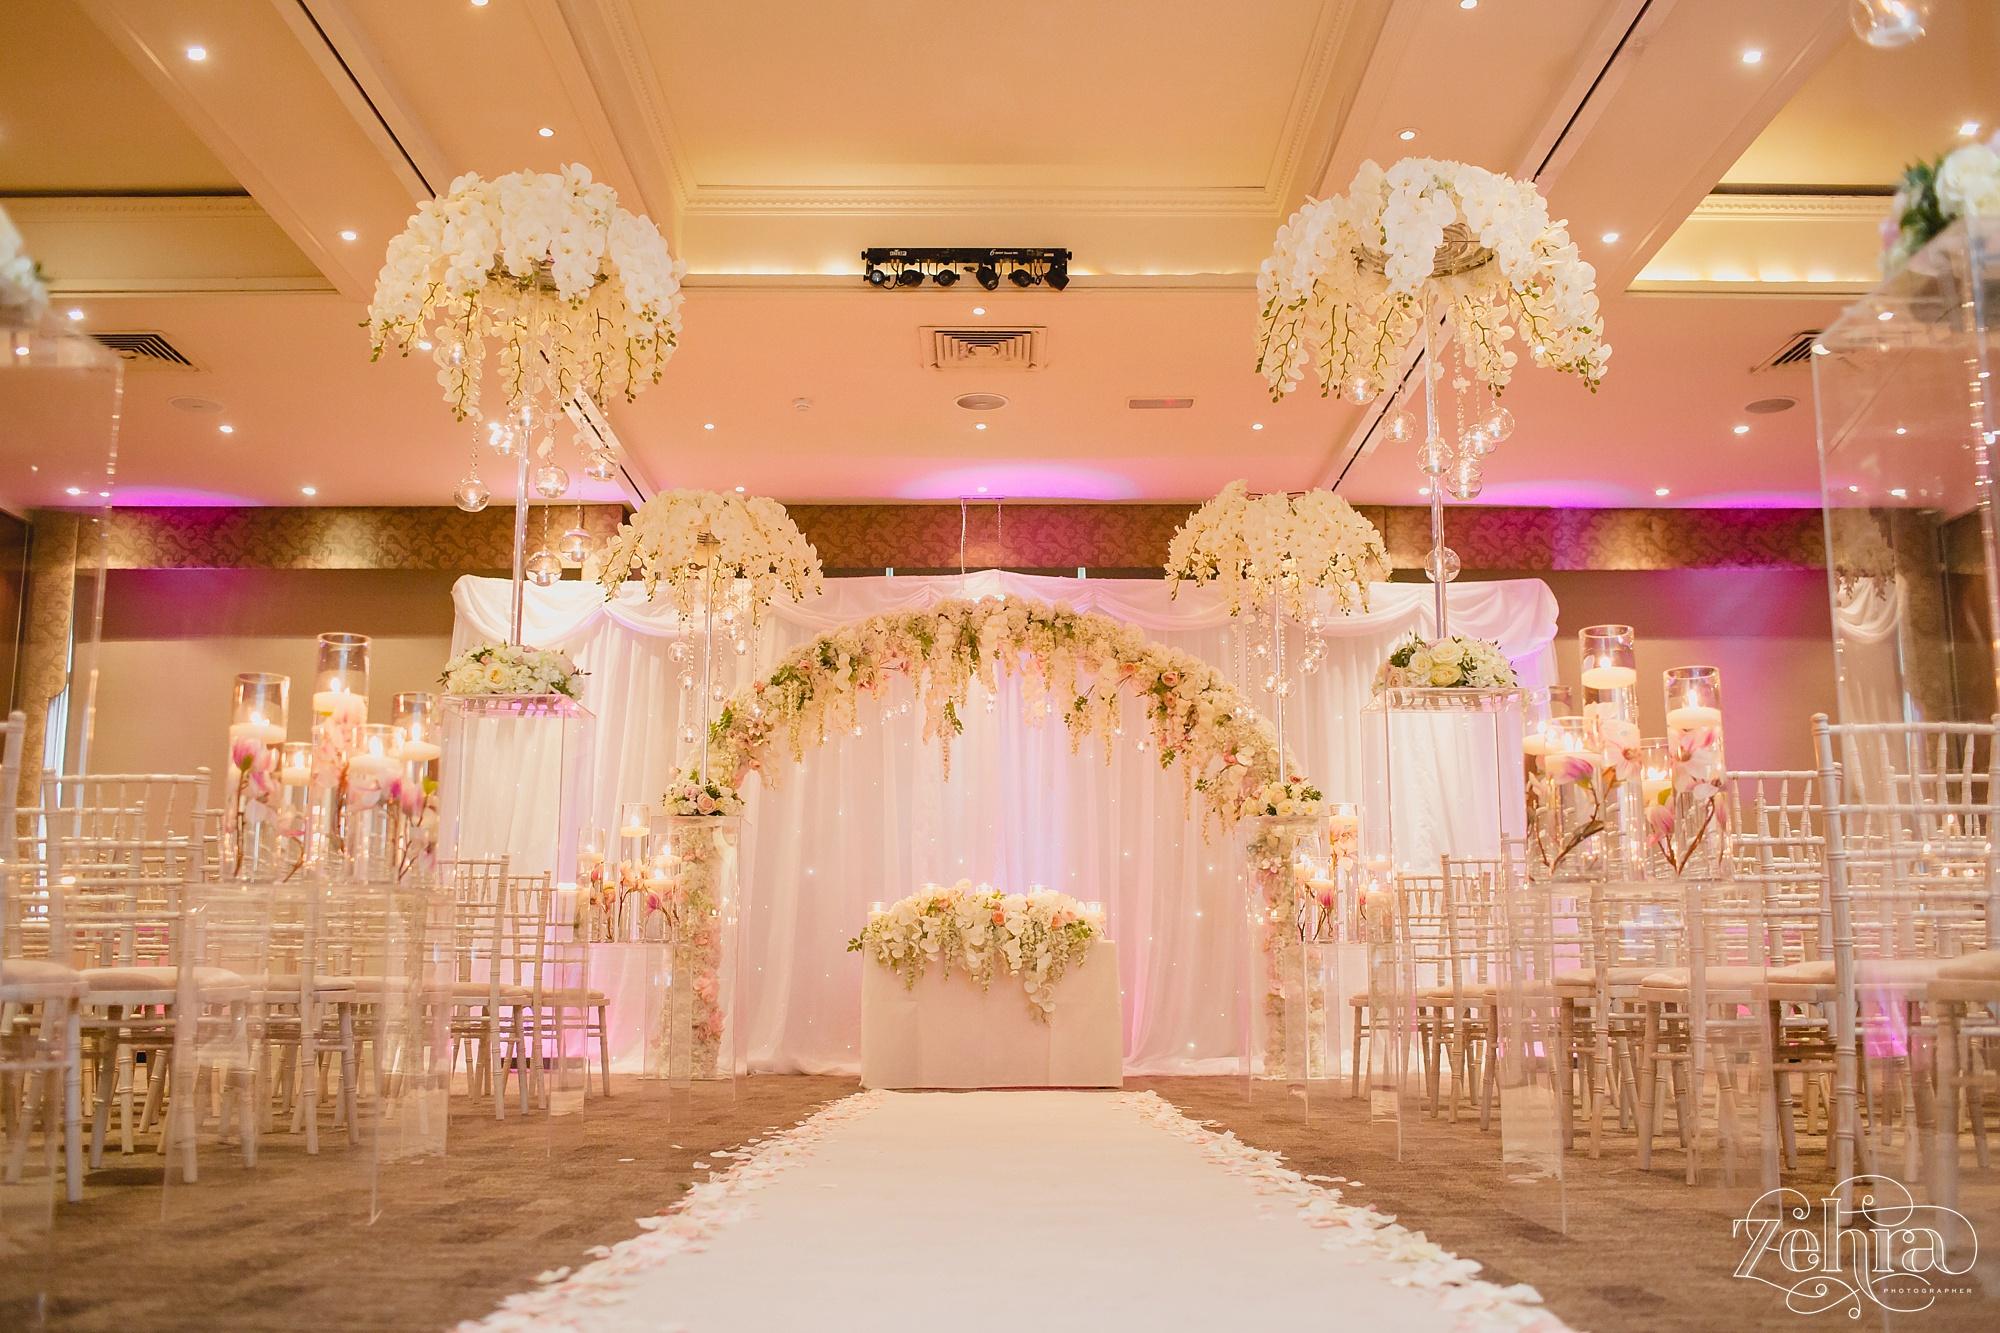 zehra photographer mere cheshire wedding_0005.jpg